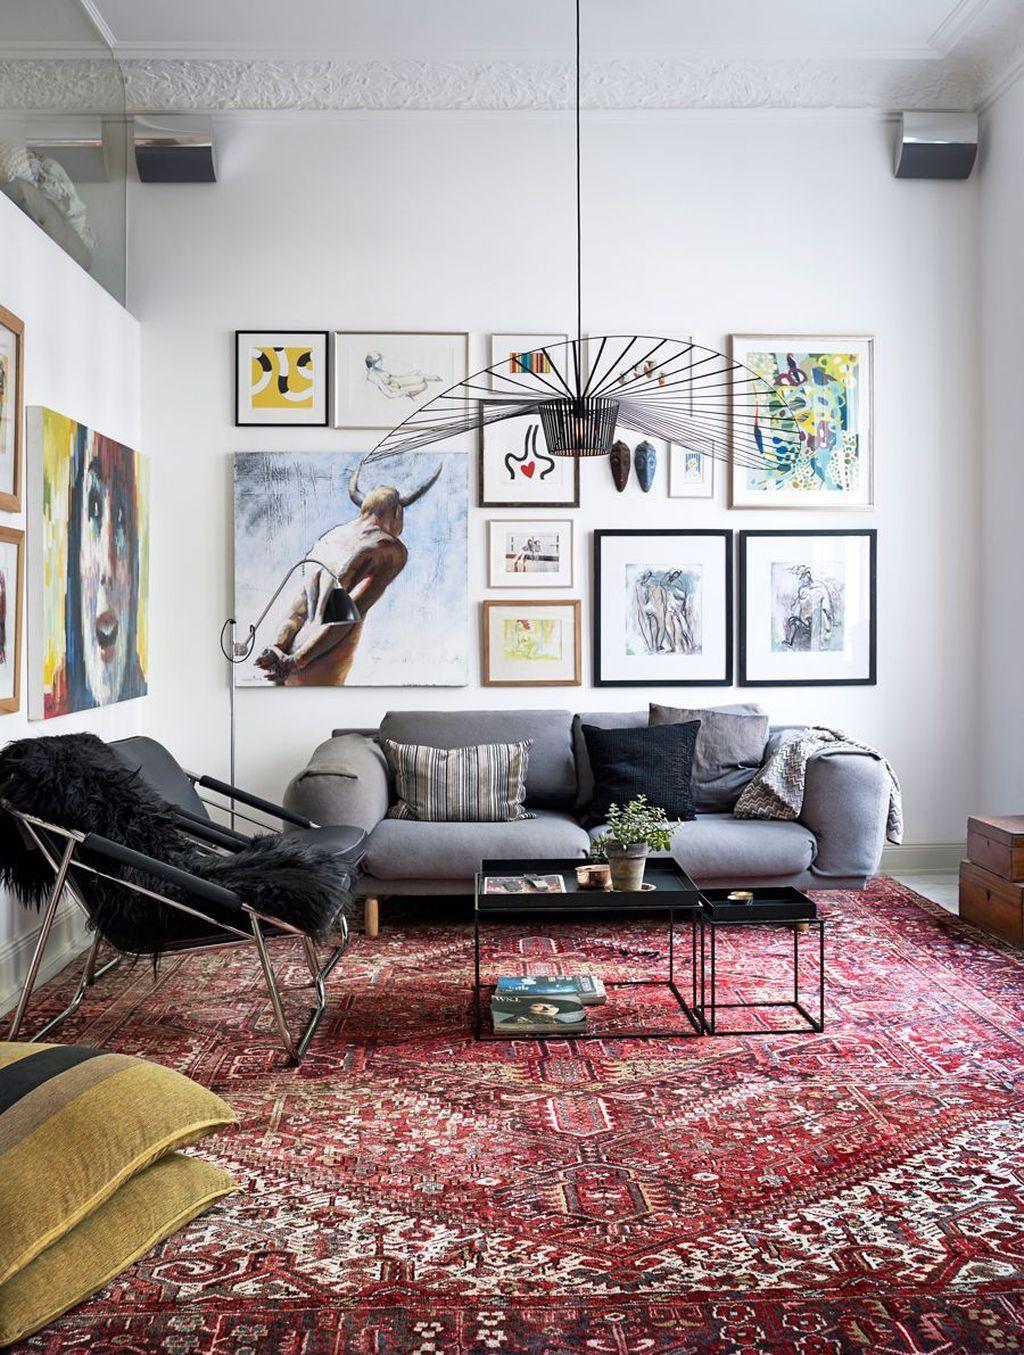 44 Beautiful Persian Rug Ideas For Living Room Decor Living Room